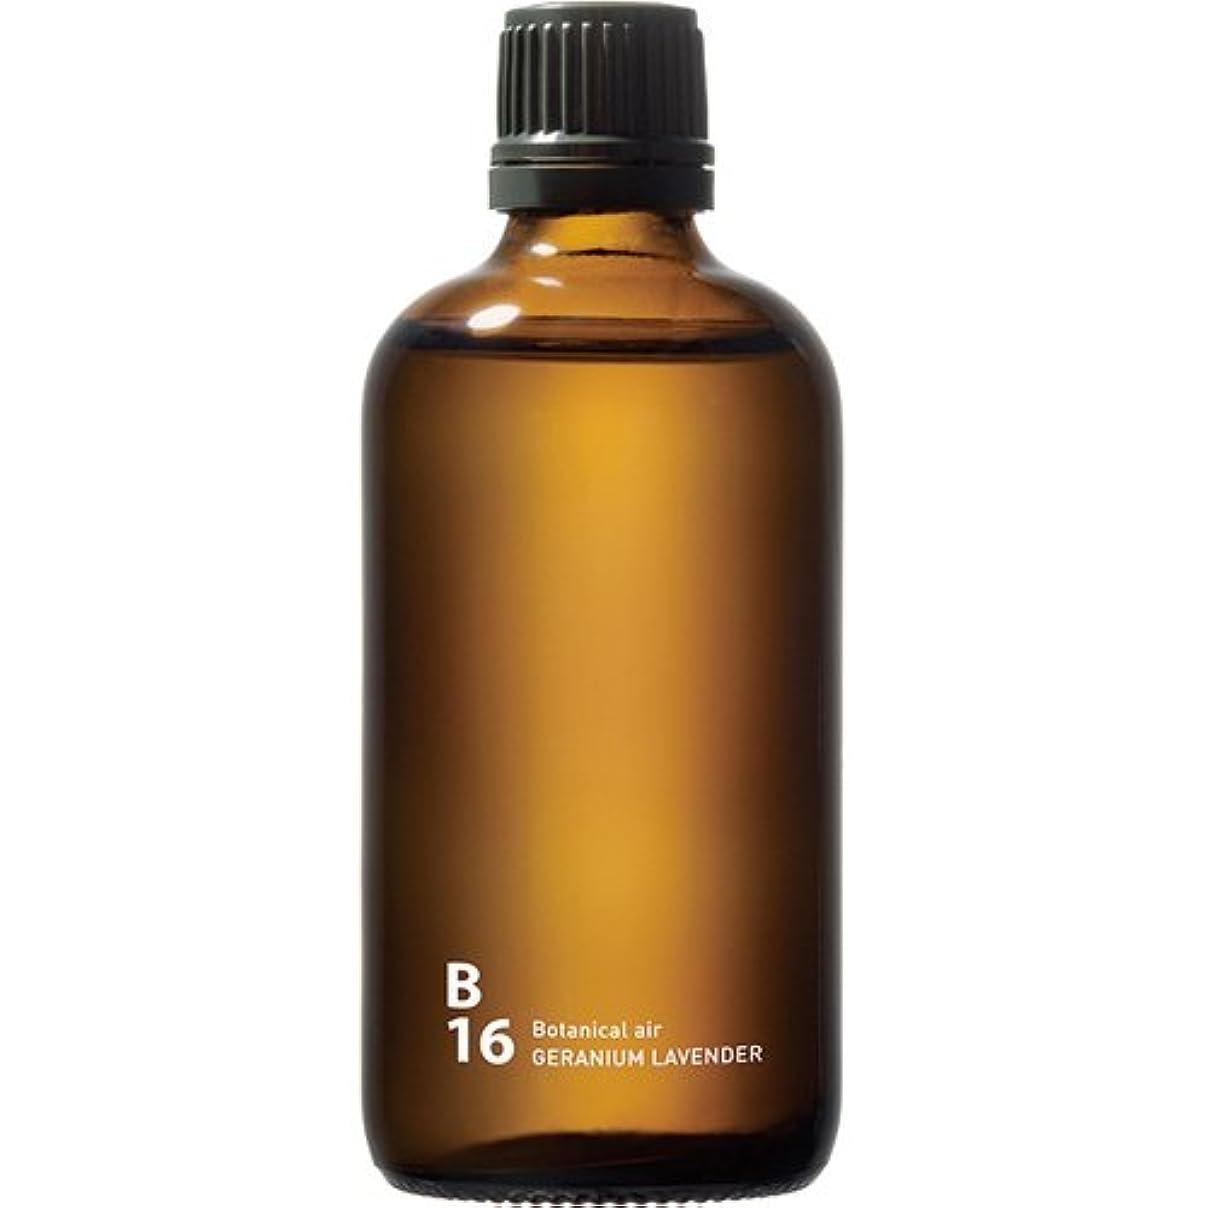 気候物理虐殺B16 GERANIUM LAVENDER piezo aroma oil 100ml